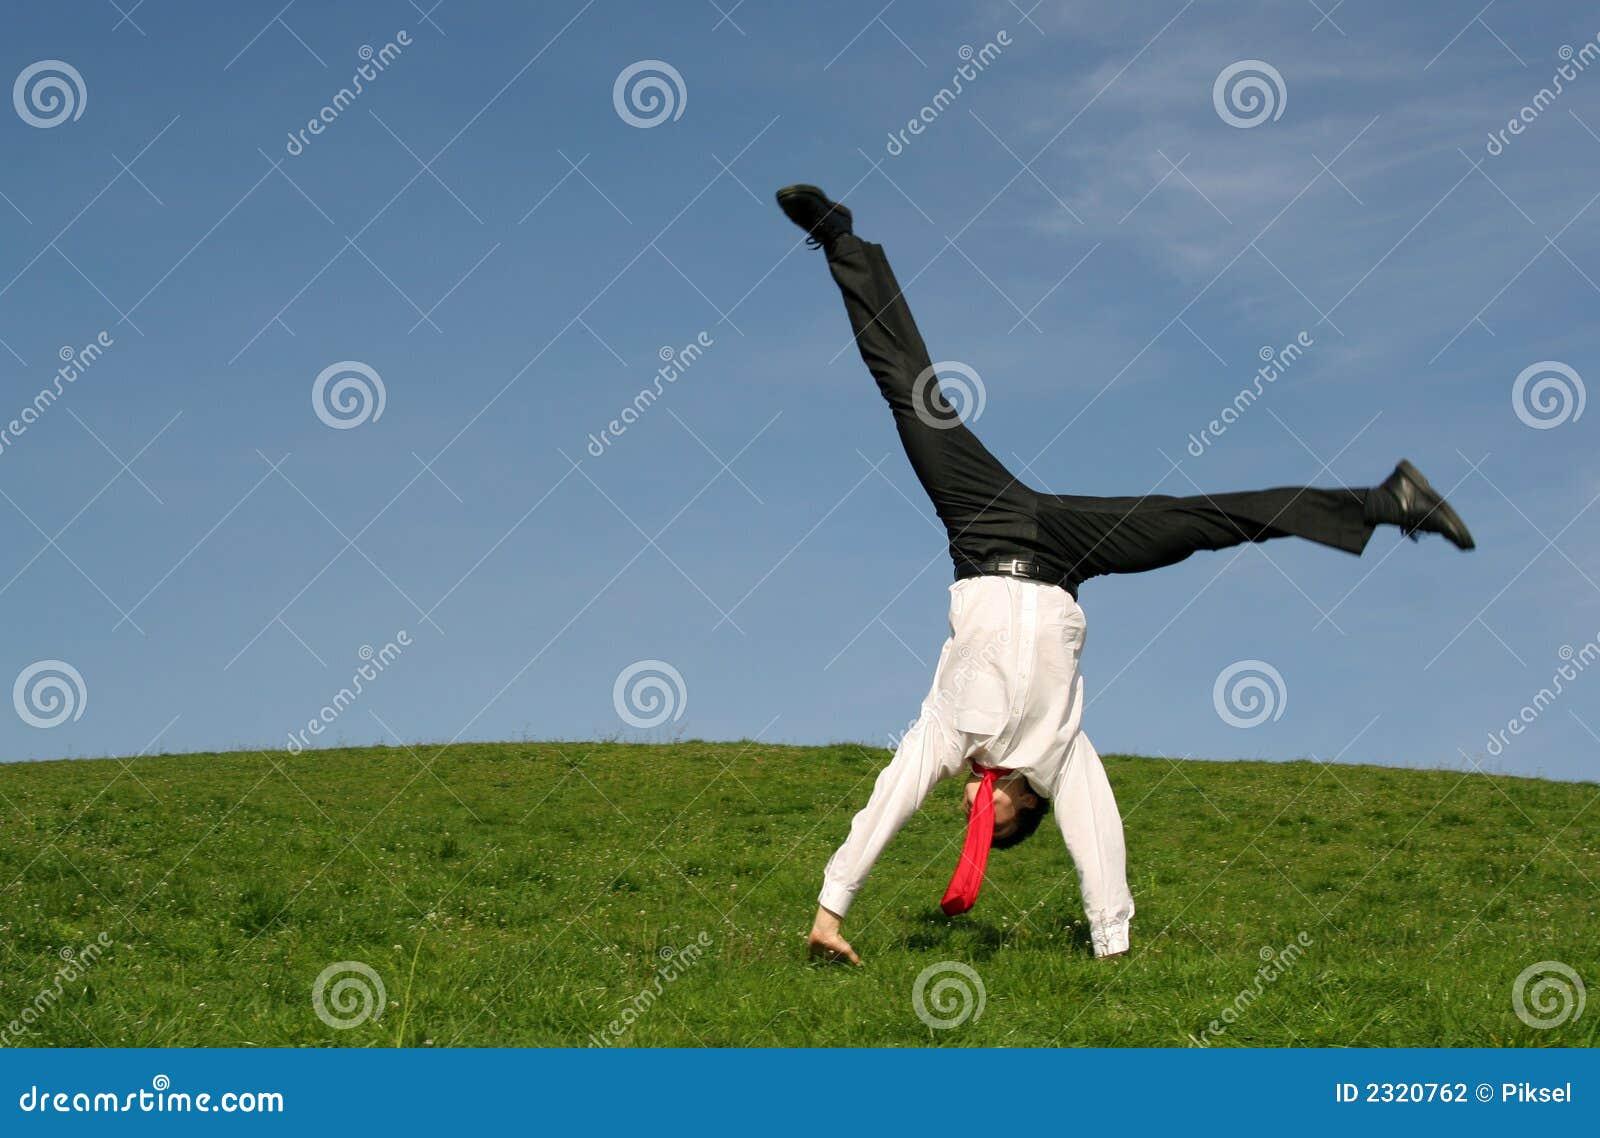 Businessman doing cartwheel